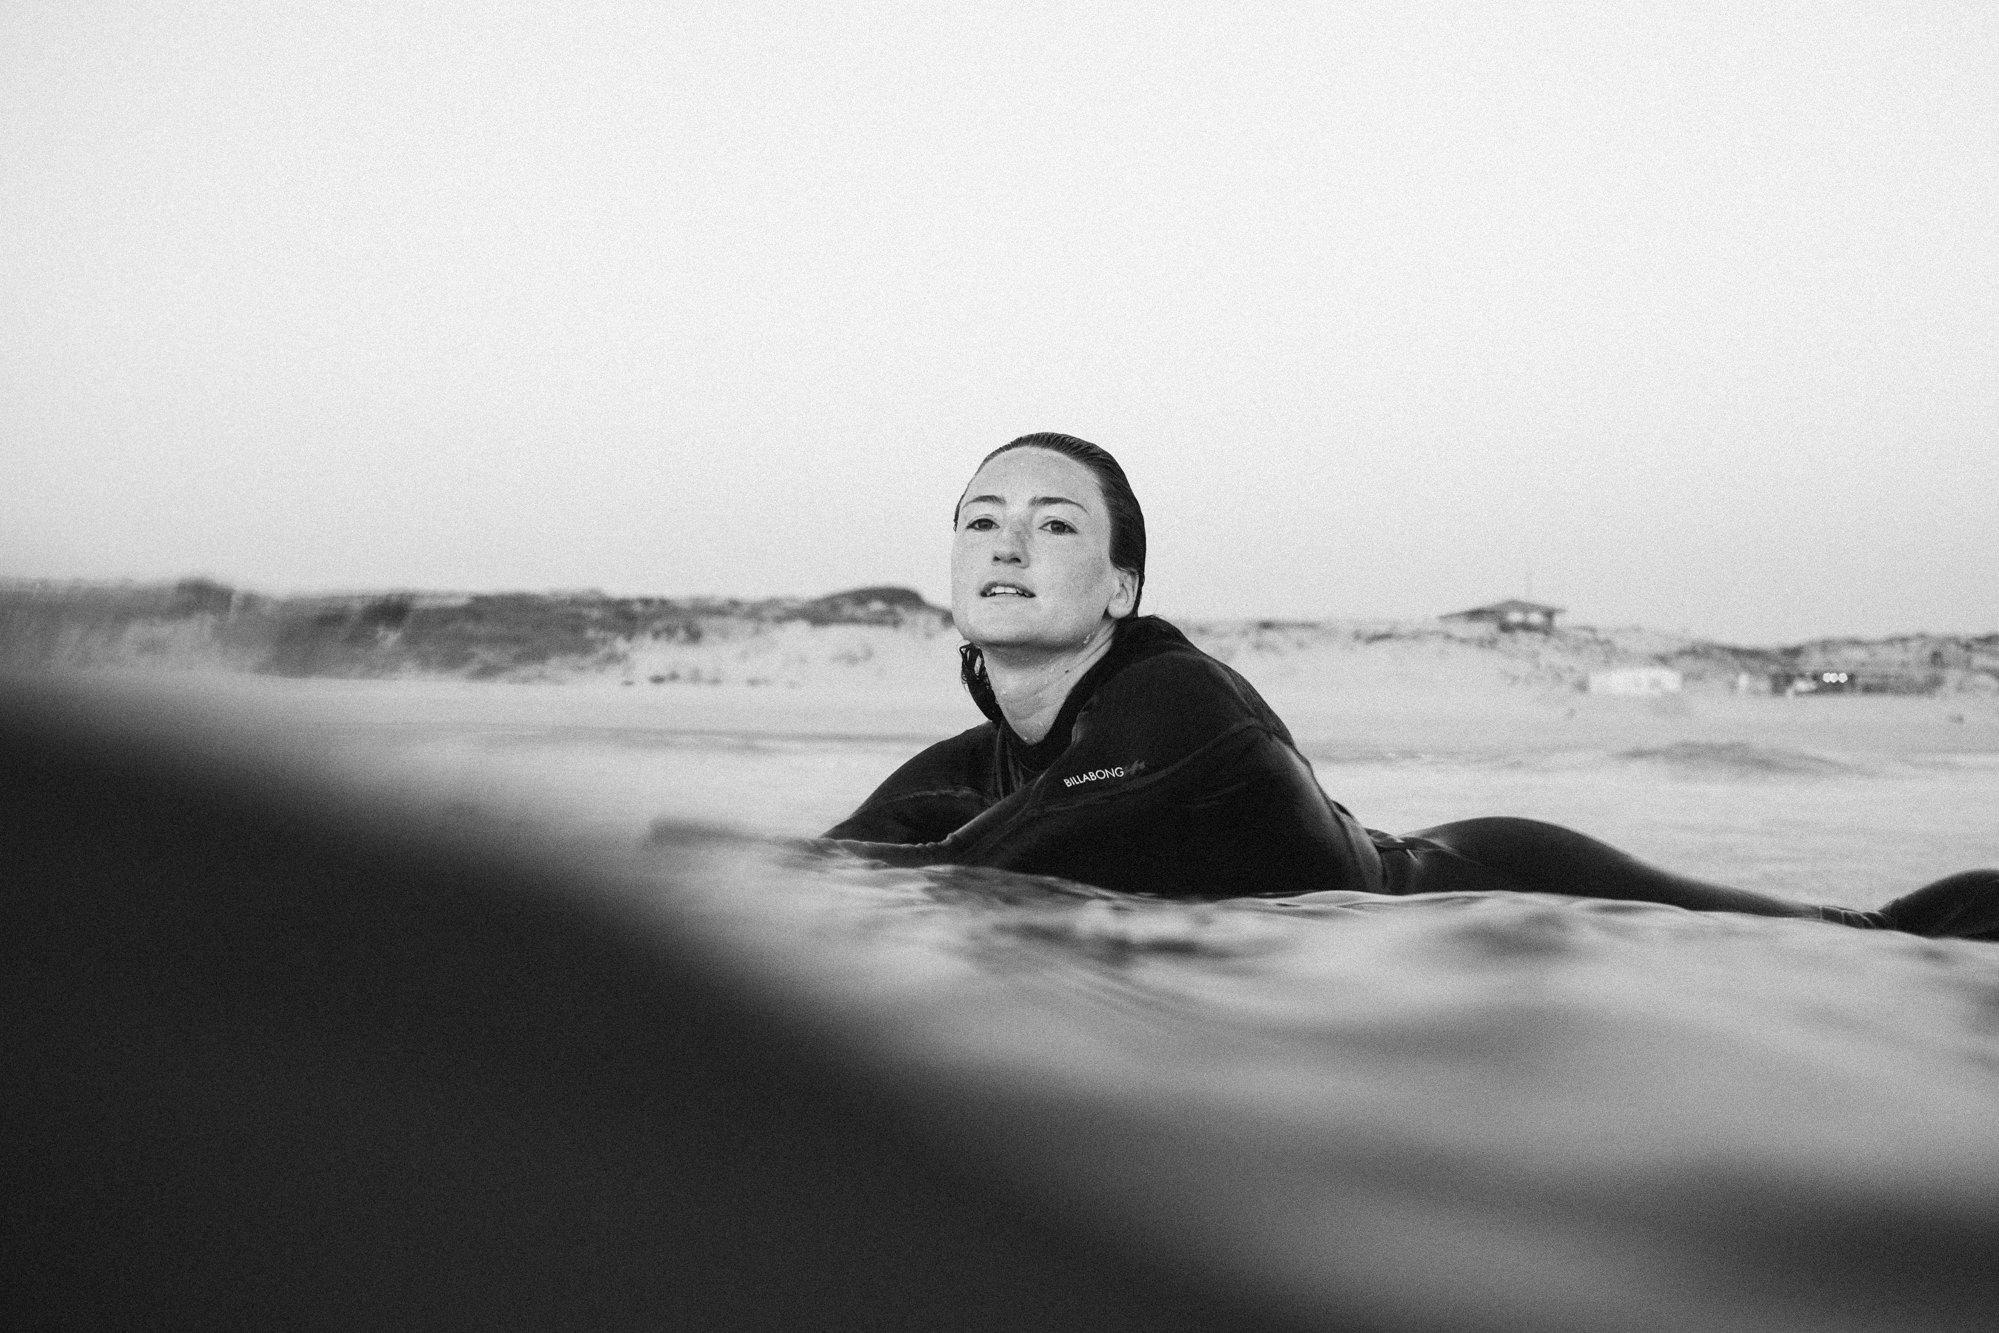 celinehamelin-photographe-aquatique-underwater-session-social-coupledansleau-ocean7.jpg